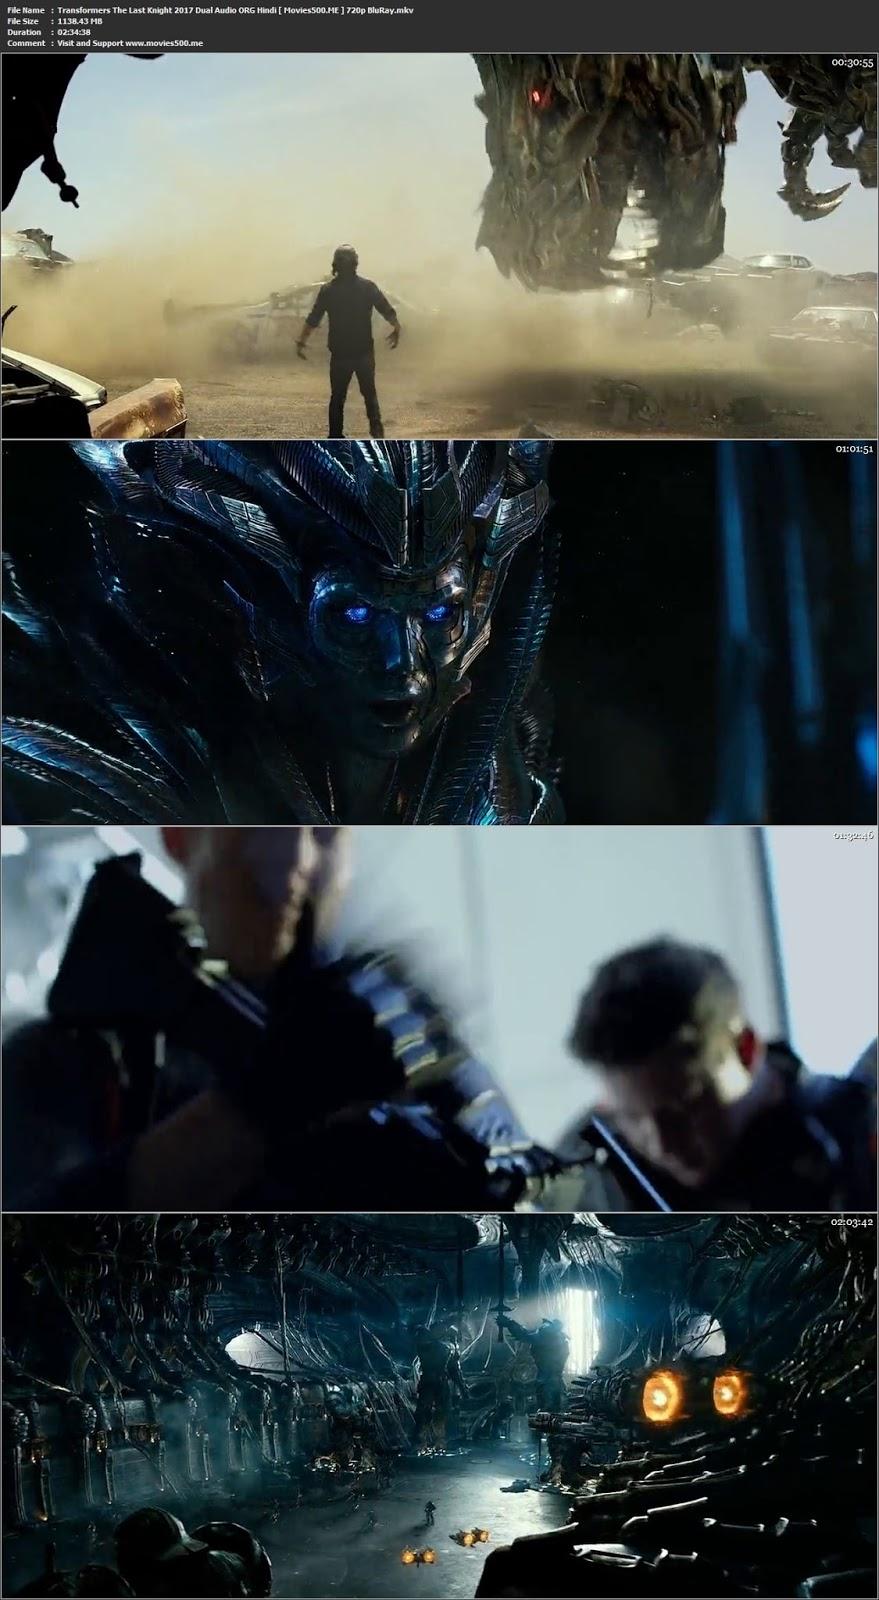 Transformers The Last Knight 2017 Dual Audio ORG Hindi BRRip 720p 1GB at movies500.site